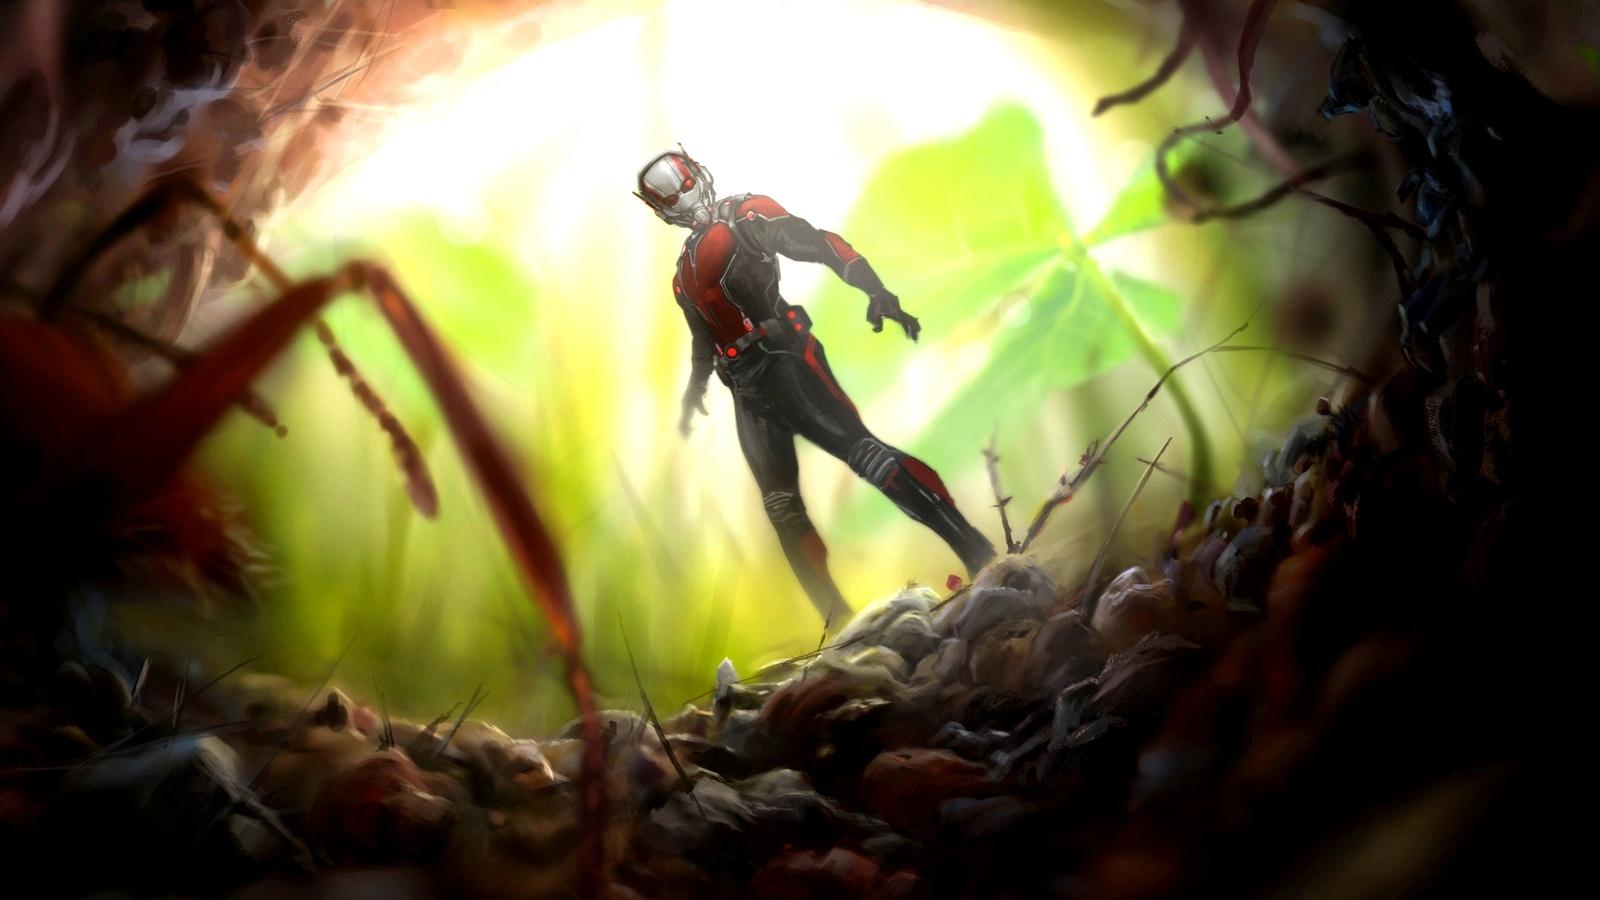 ant_man_2015_artworks-1600x900.jpg